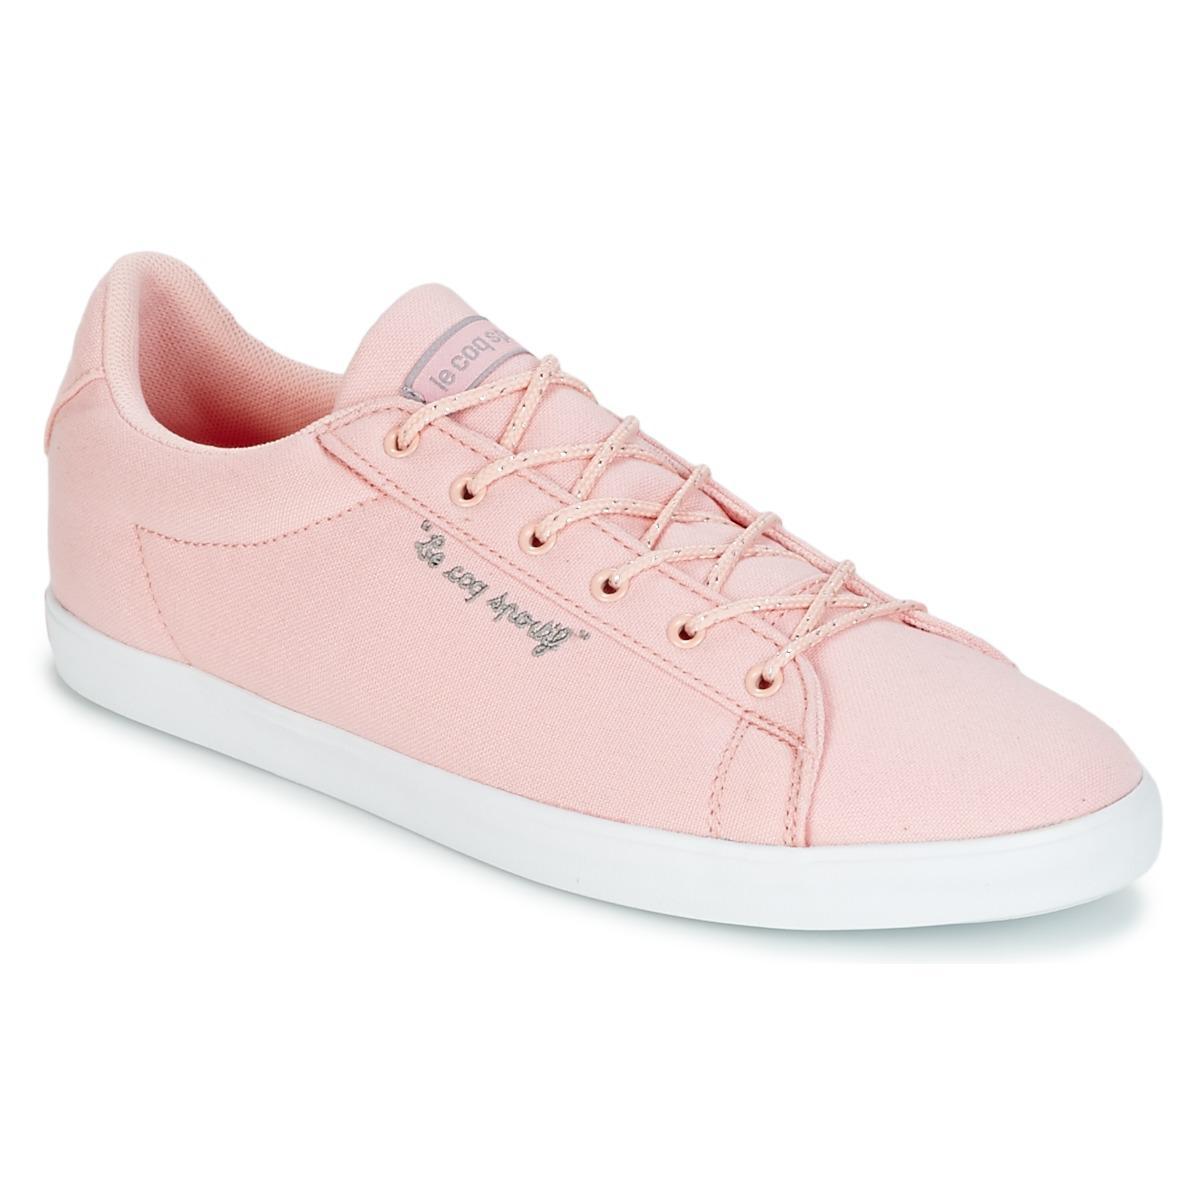 ae5dcda6e82 ... qen 6306 cute sneaker athletic shoes boys girls kindergarten school go  out brok c6d1b 9962f; promo code for le coq sportif 5d321 2e9fb